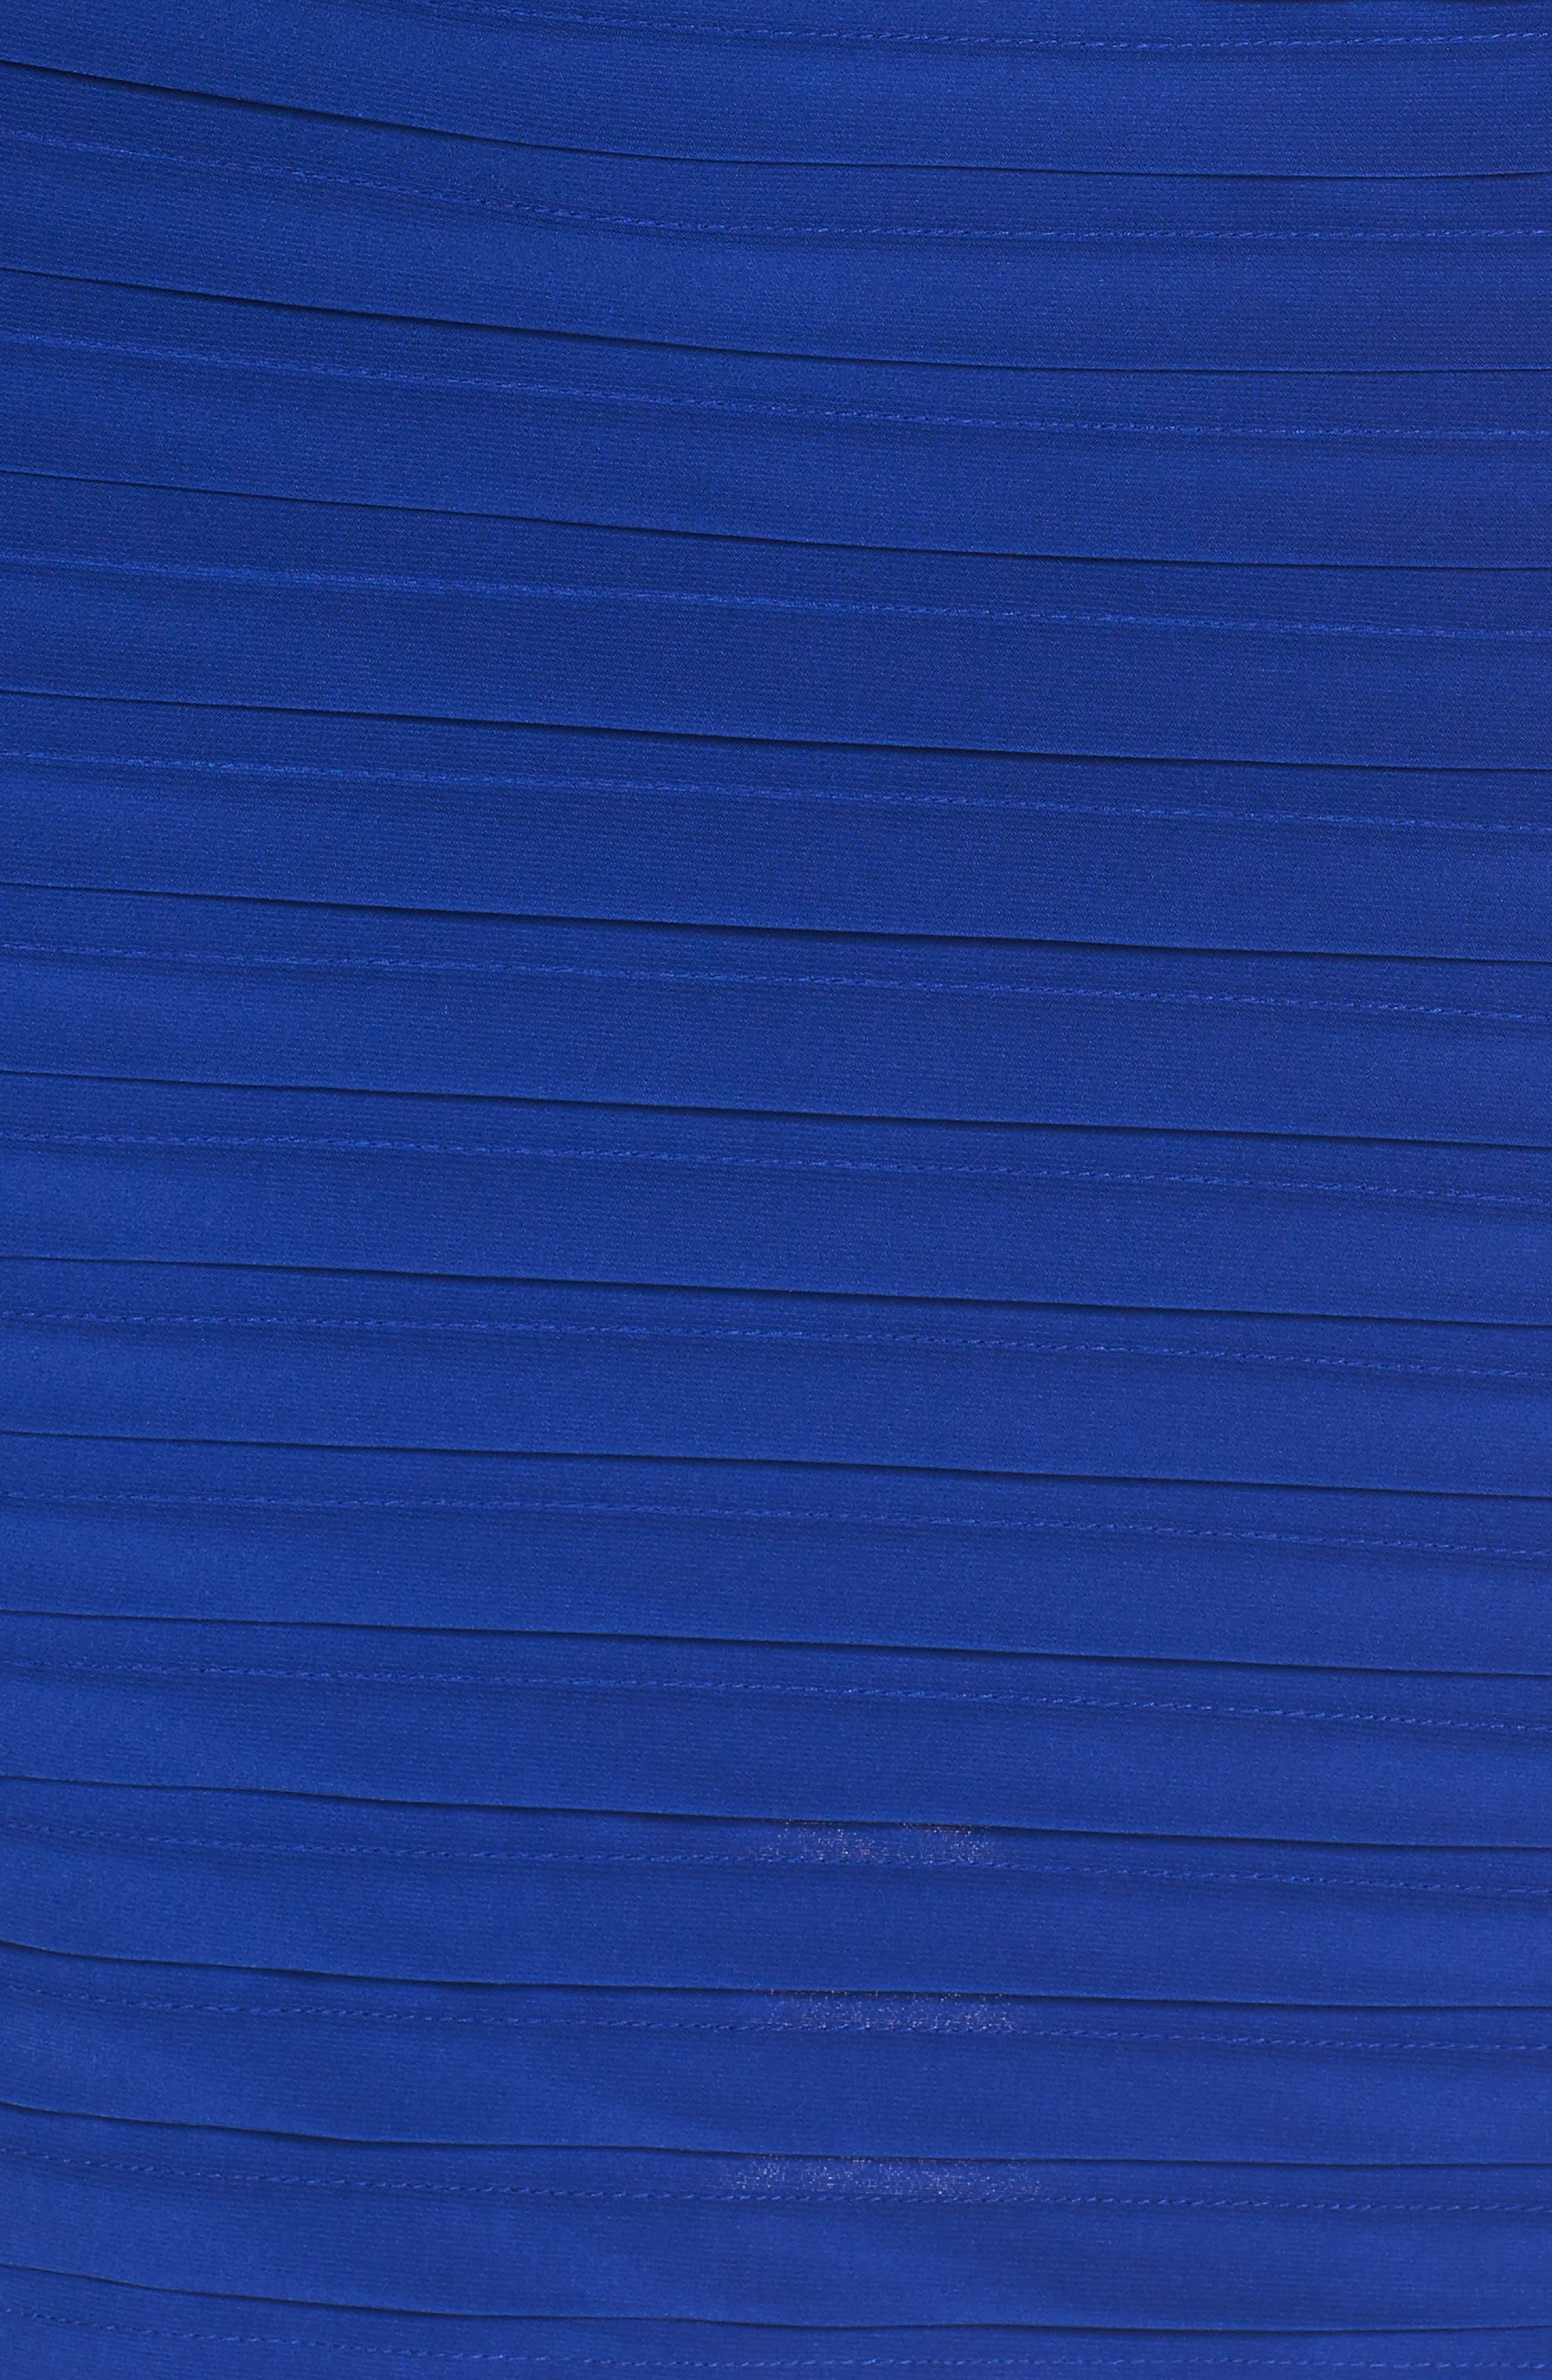 Shutter Pleat Popover Sheath Dress,                             Alternate thumbnail 5, color,                             Sapphire